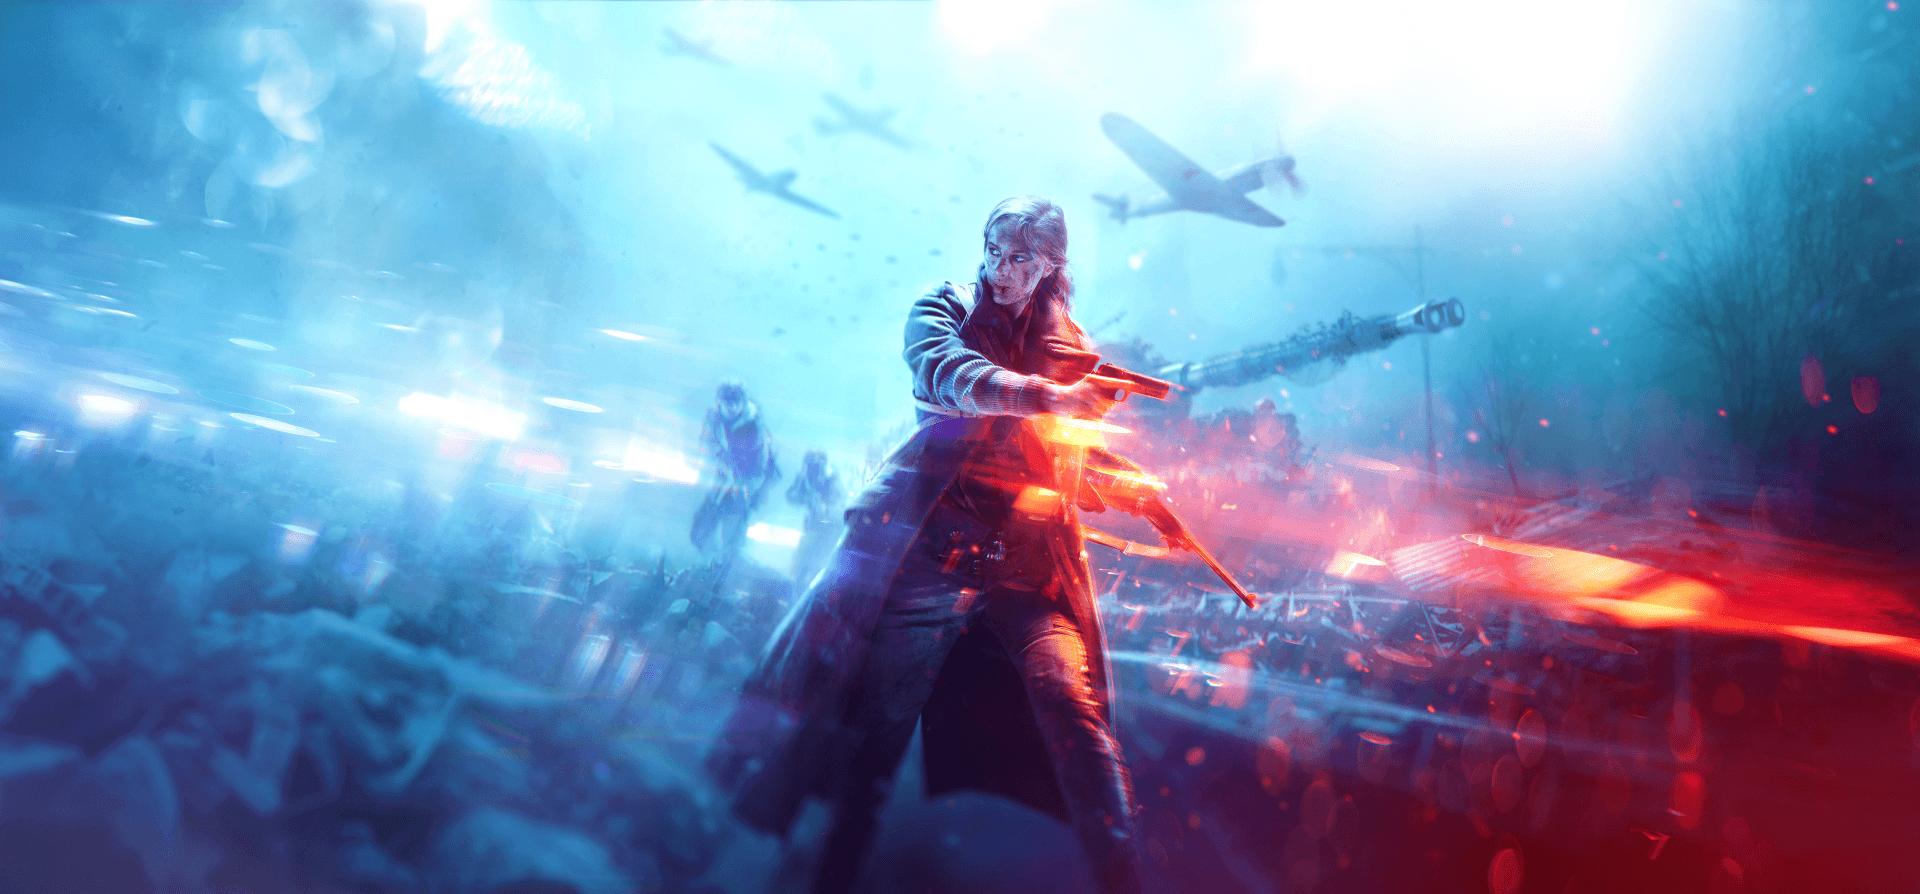 Battlefield 21 Wallpapers on WallpaperDog